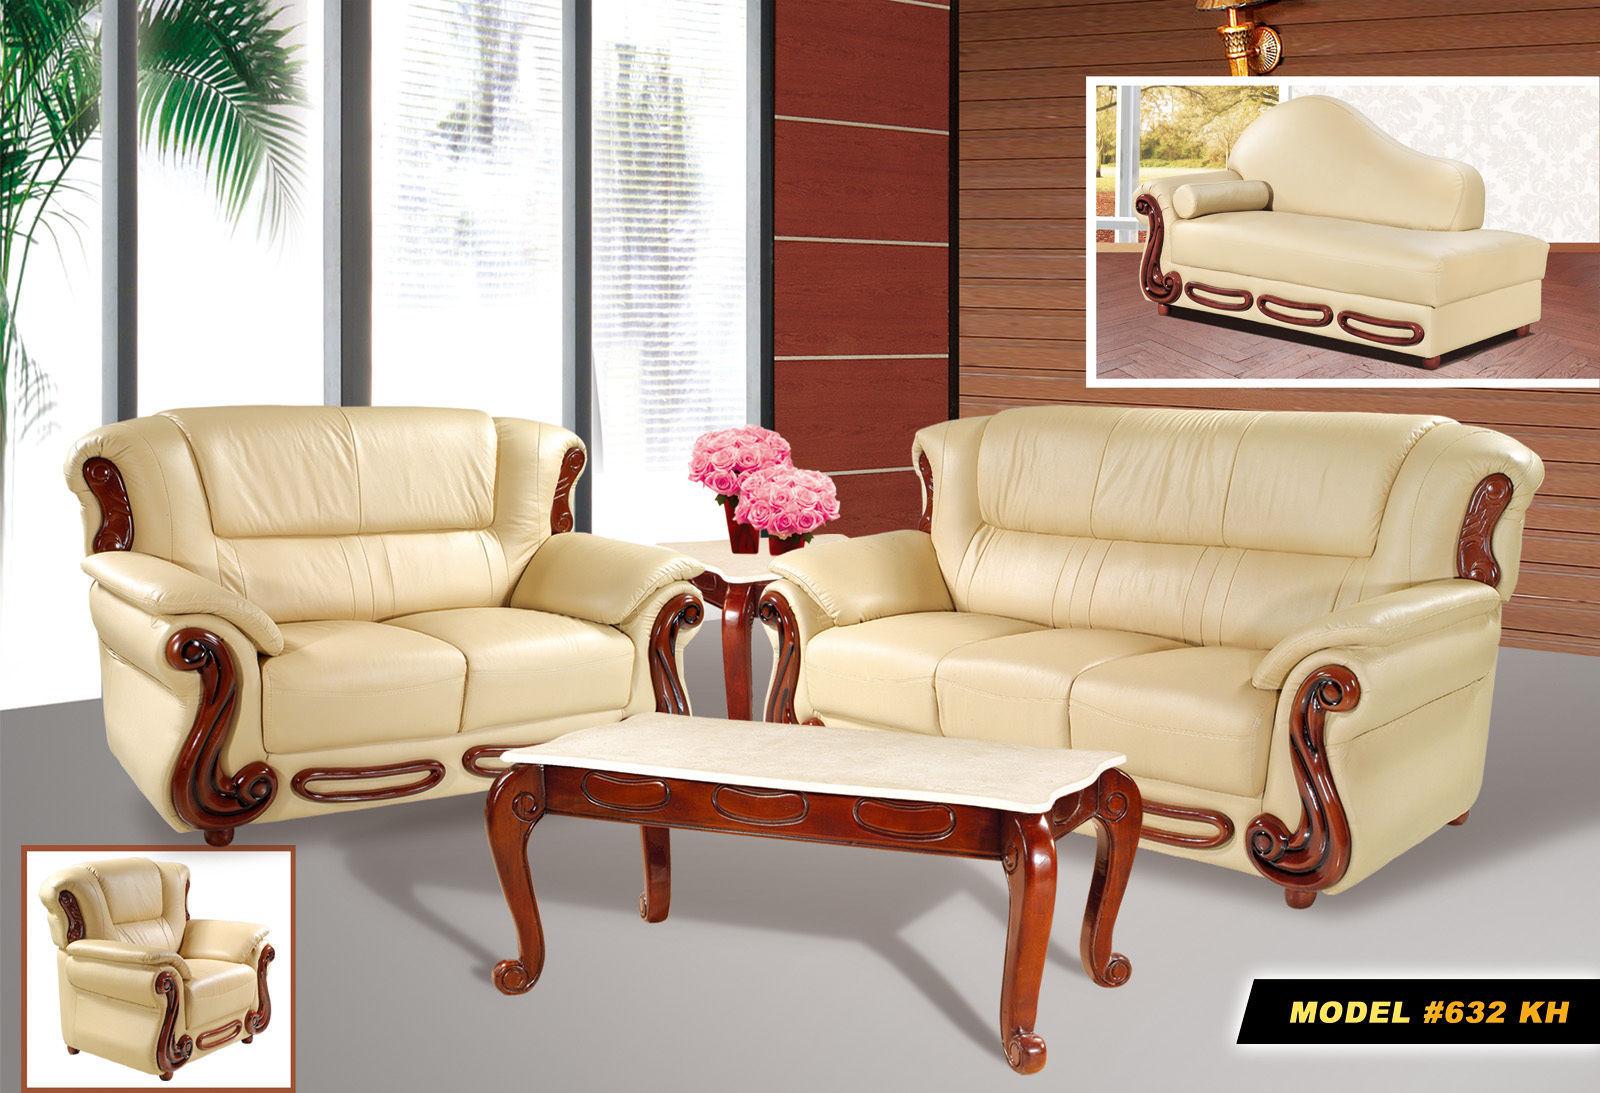 Meridian 632 Bella Living Room Set 2pcs in Khaki Bonded Leather Traditional